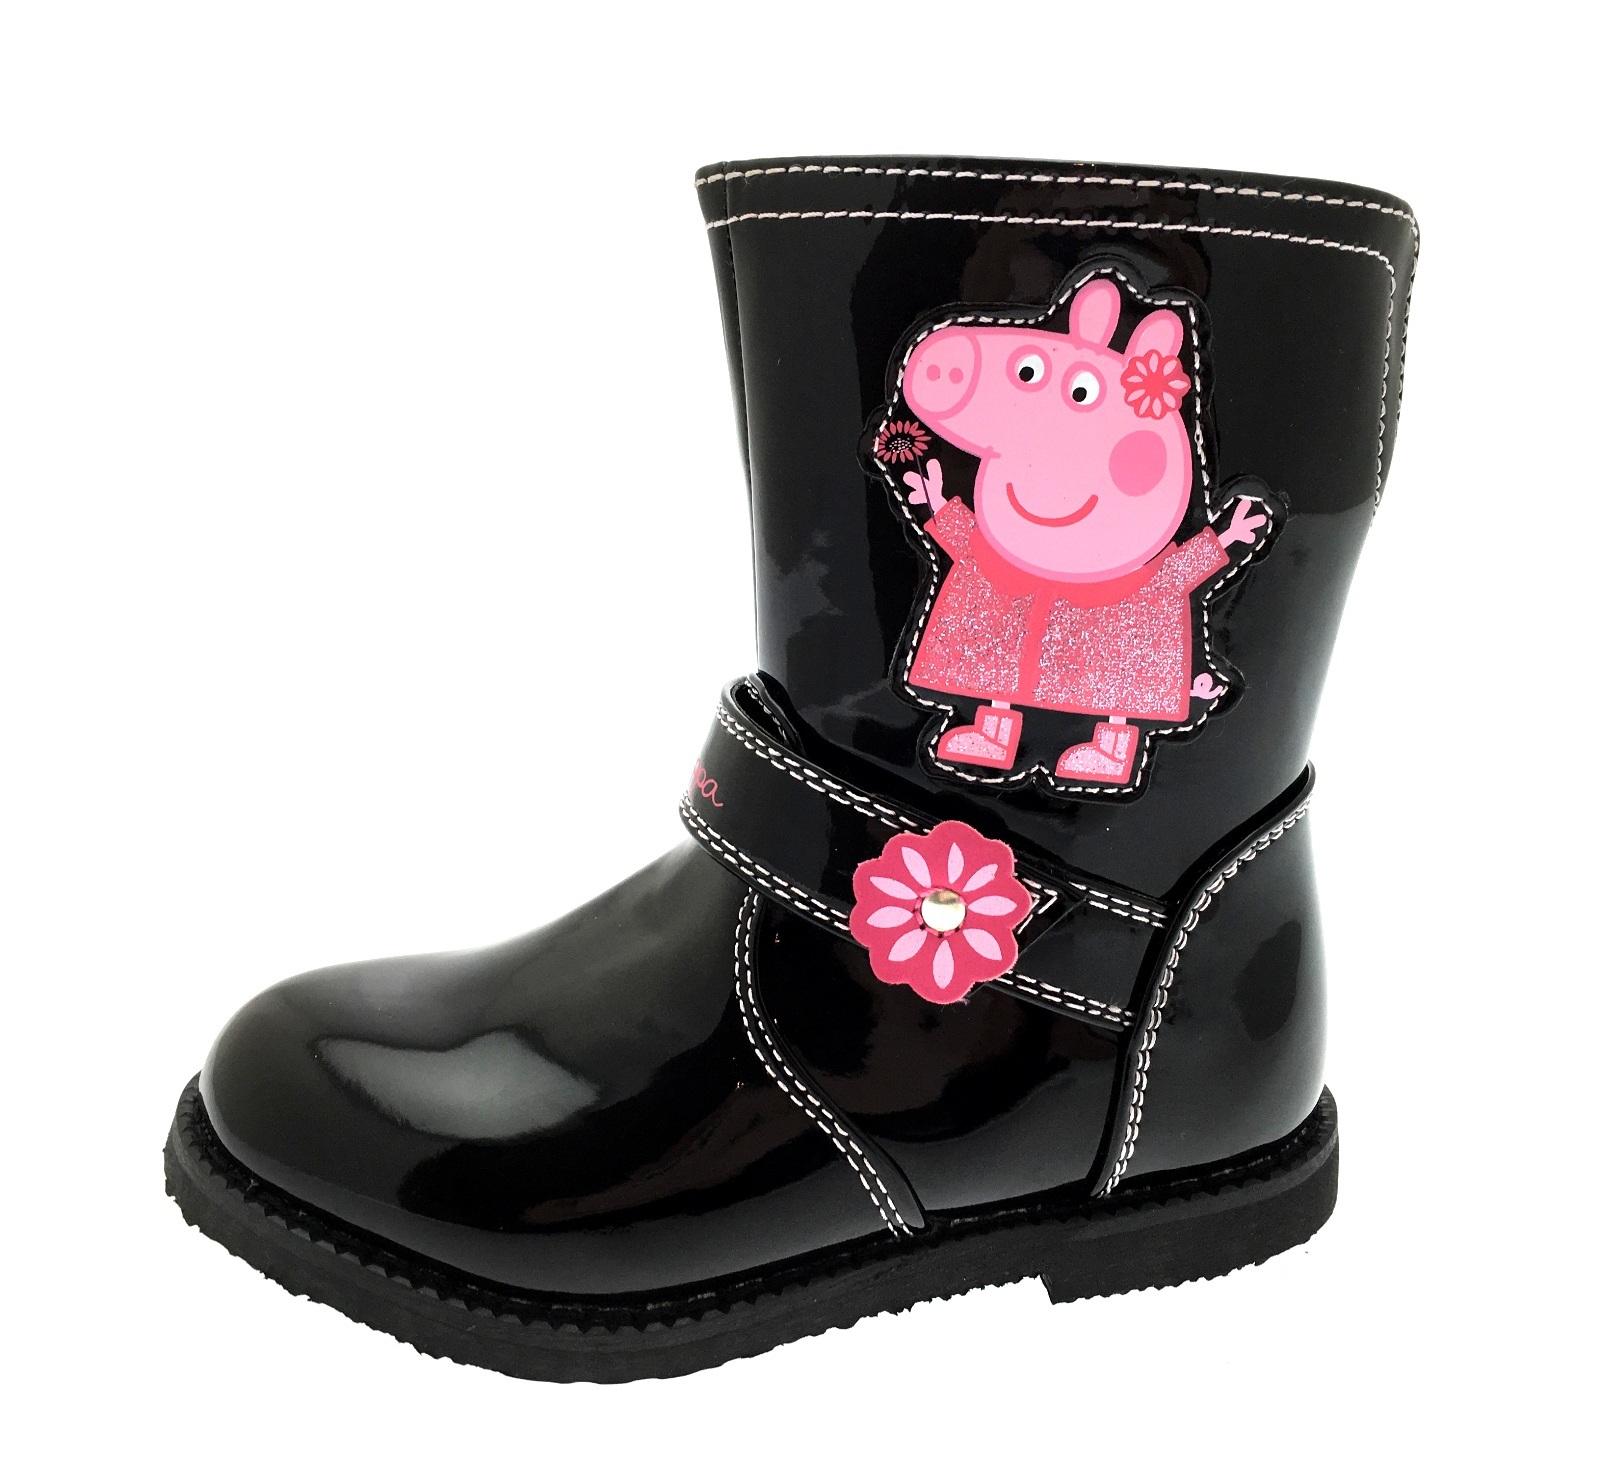 girls peppa pig boots mid calf warm winter glitter character shoes kids size